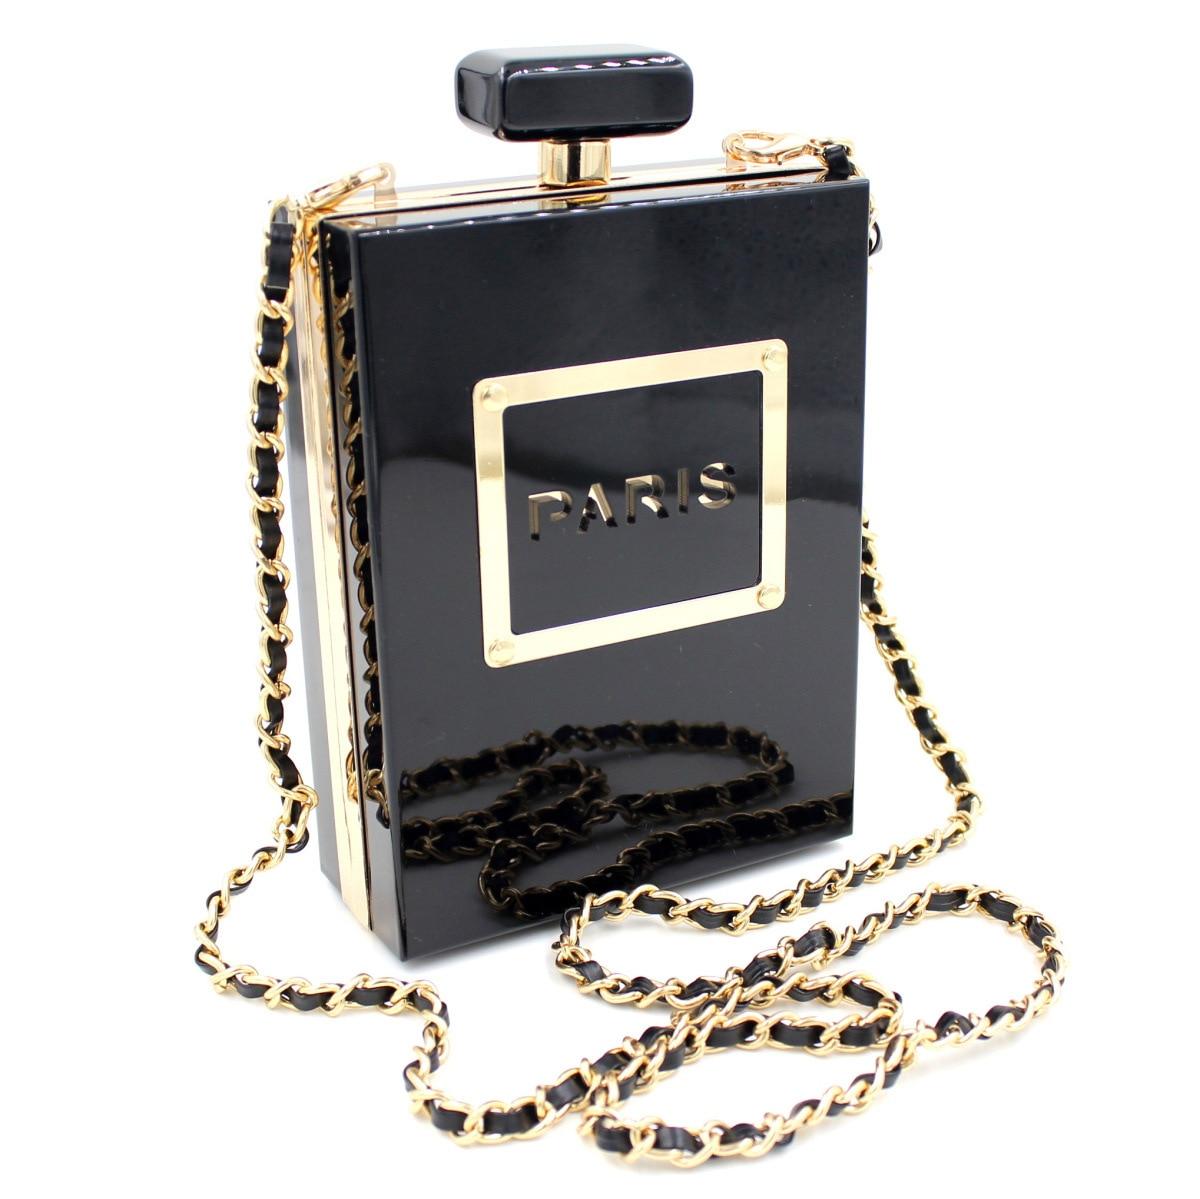 2016 Bolsa Feminina Bolsos Seckill Europa transparente Perfume botella paquete Yanbao alta calidad pasarela mano Bao Daifa banquete